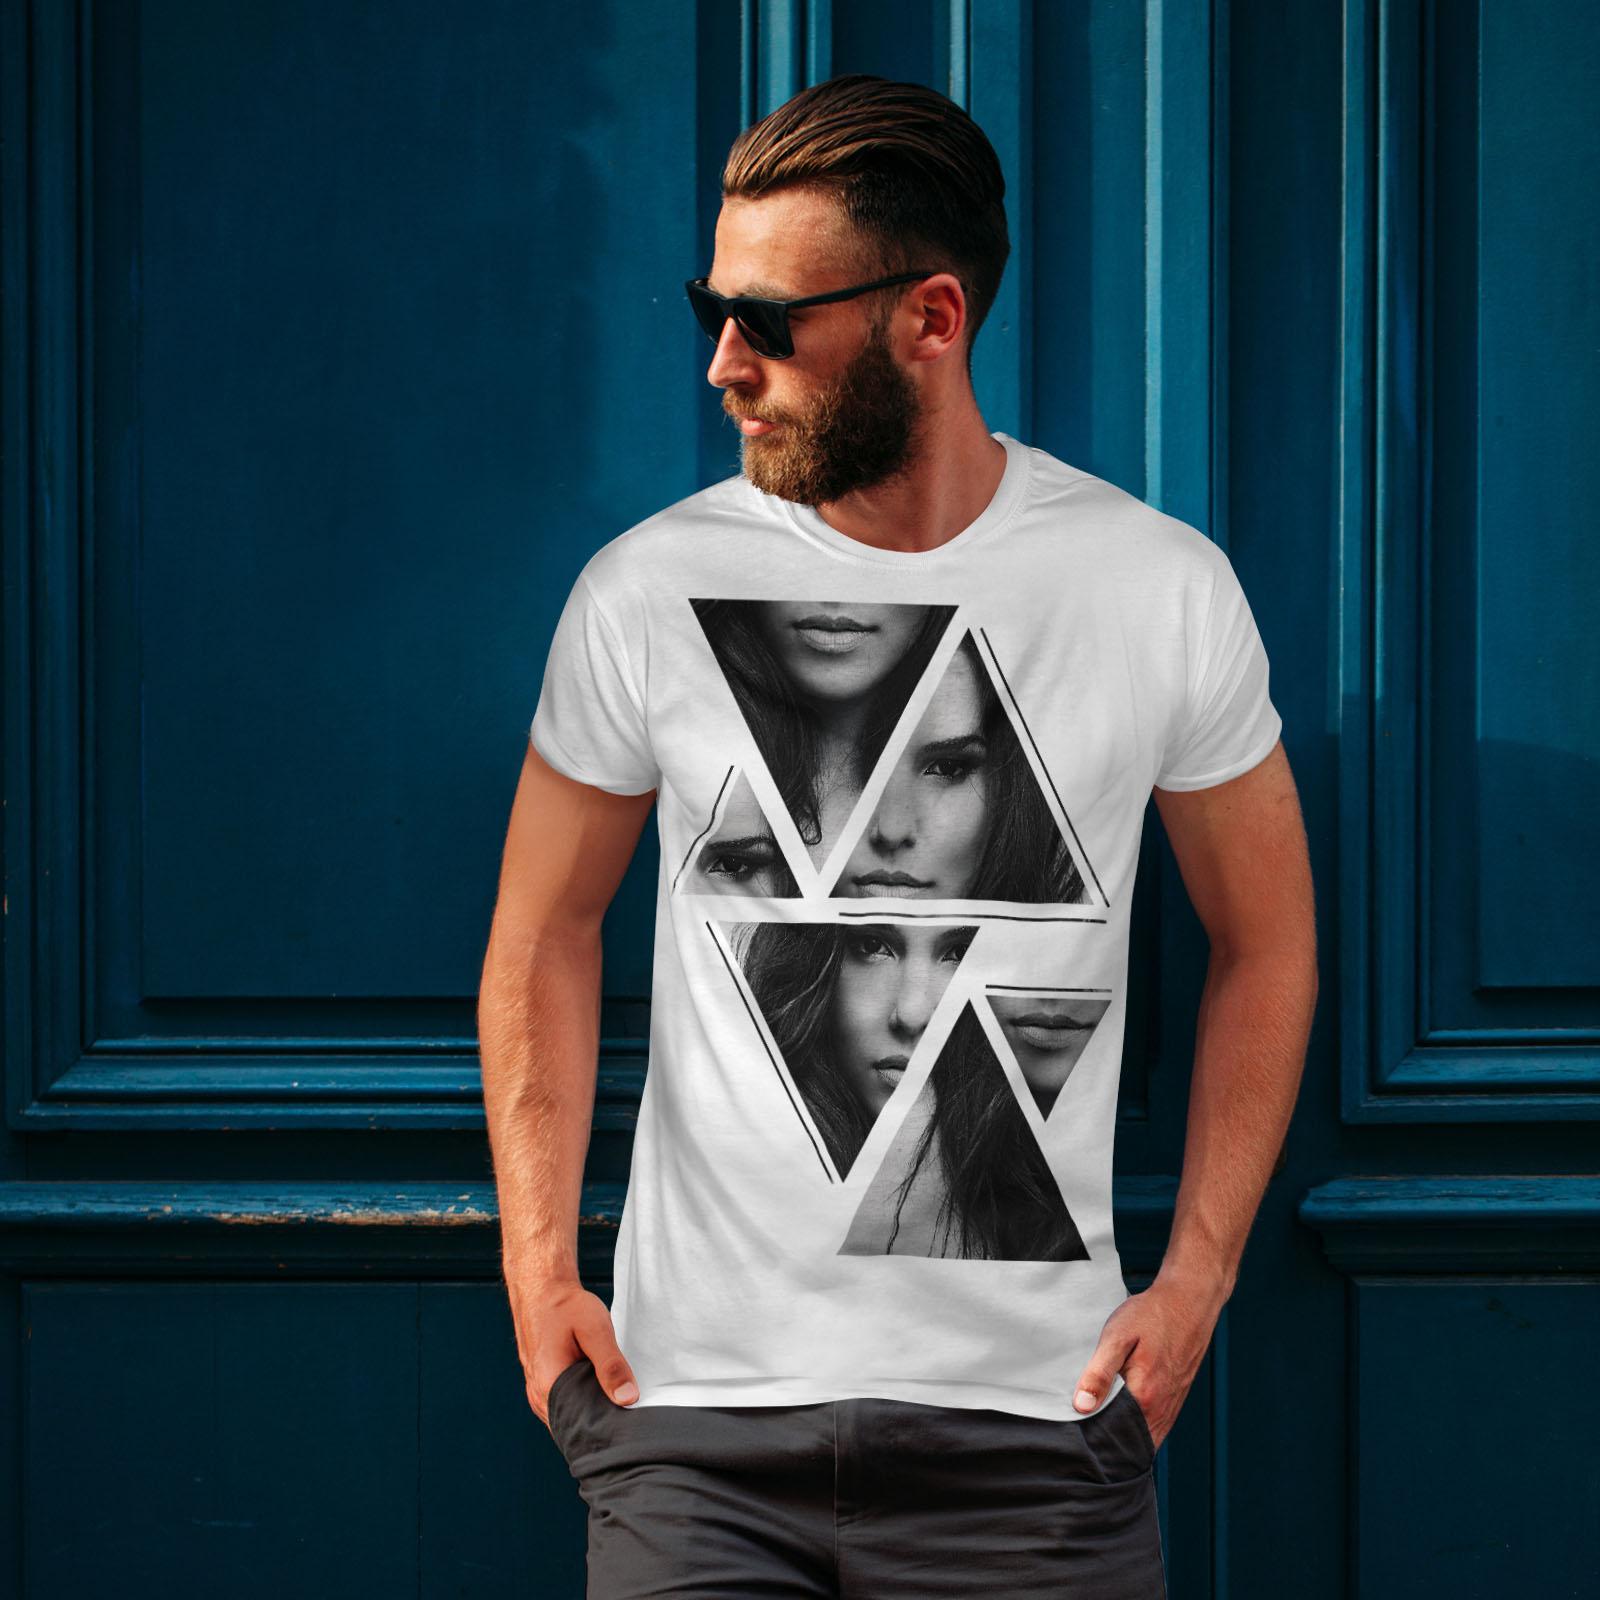 Wellcoda-Art-Fashion-Face-T-shirt-homme-Abstract-Design-graphique-imprime-Tee miniature 10